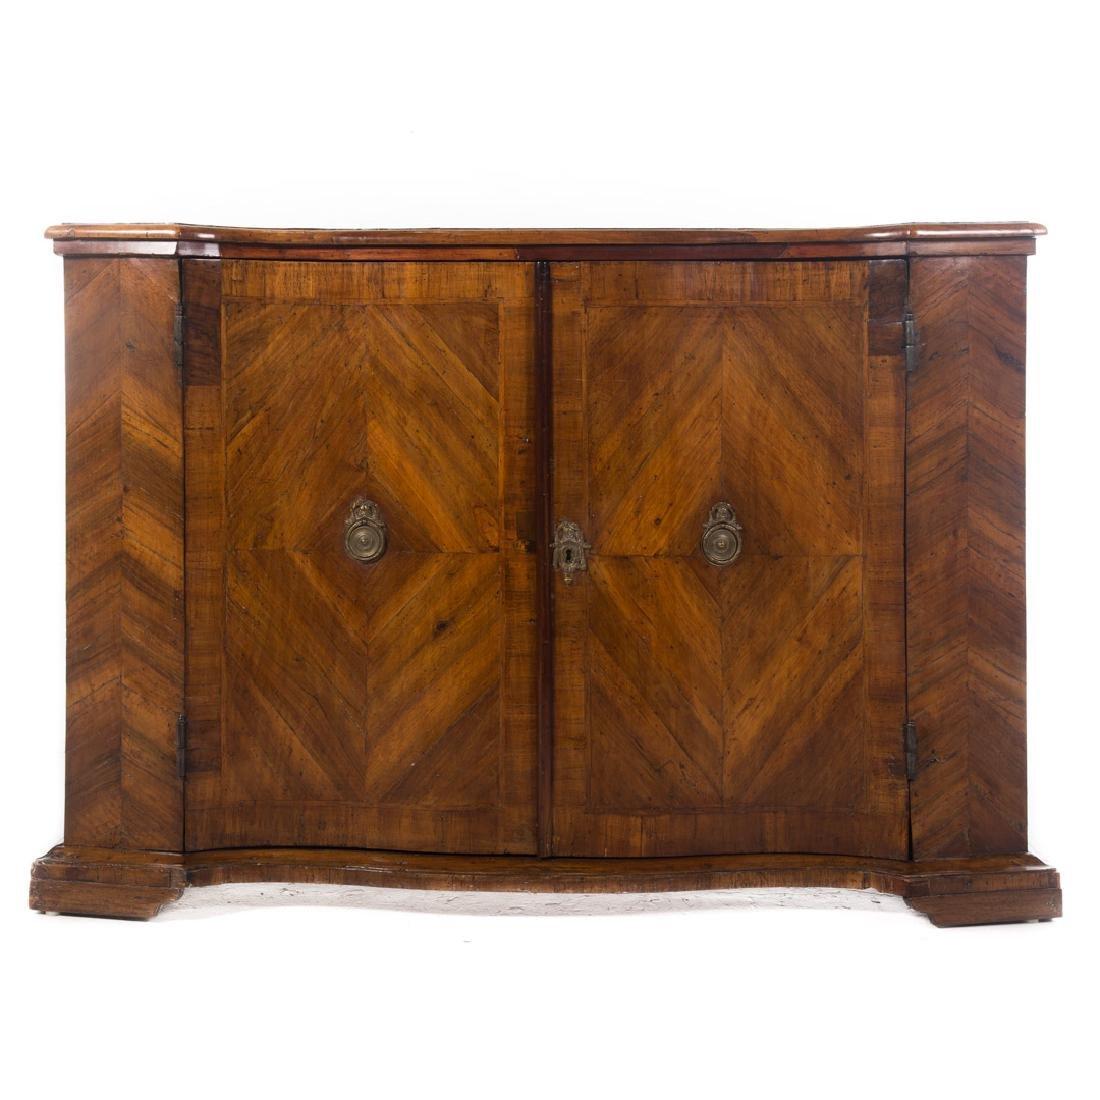 Continental parquetry walnut cabinet